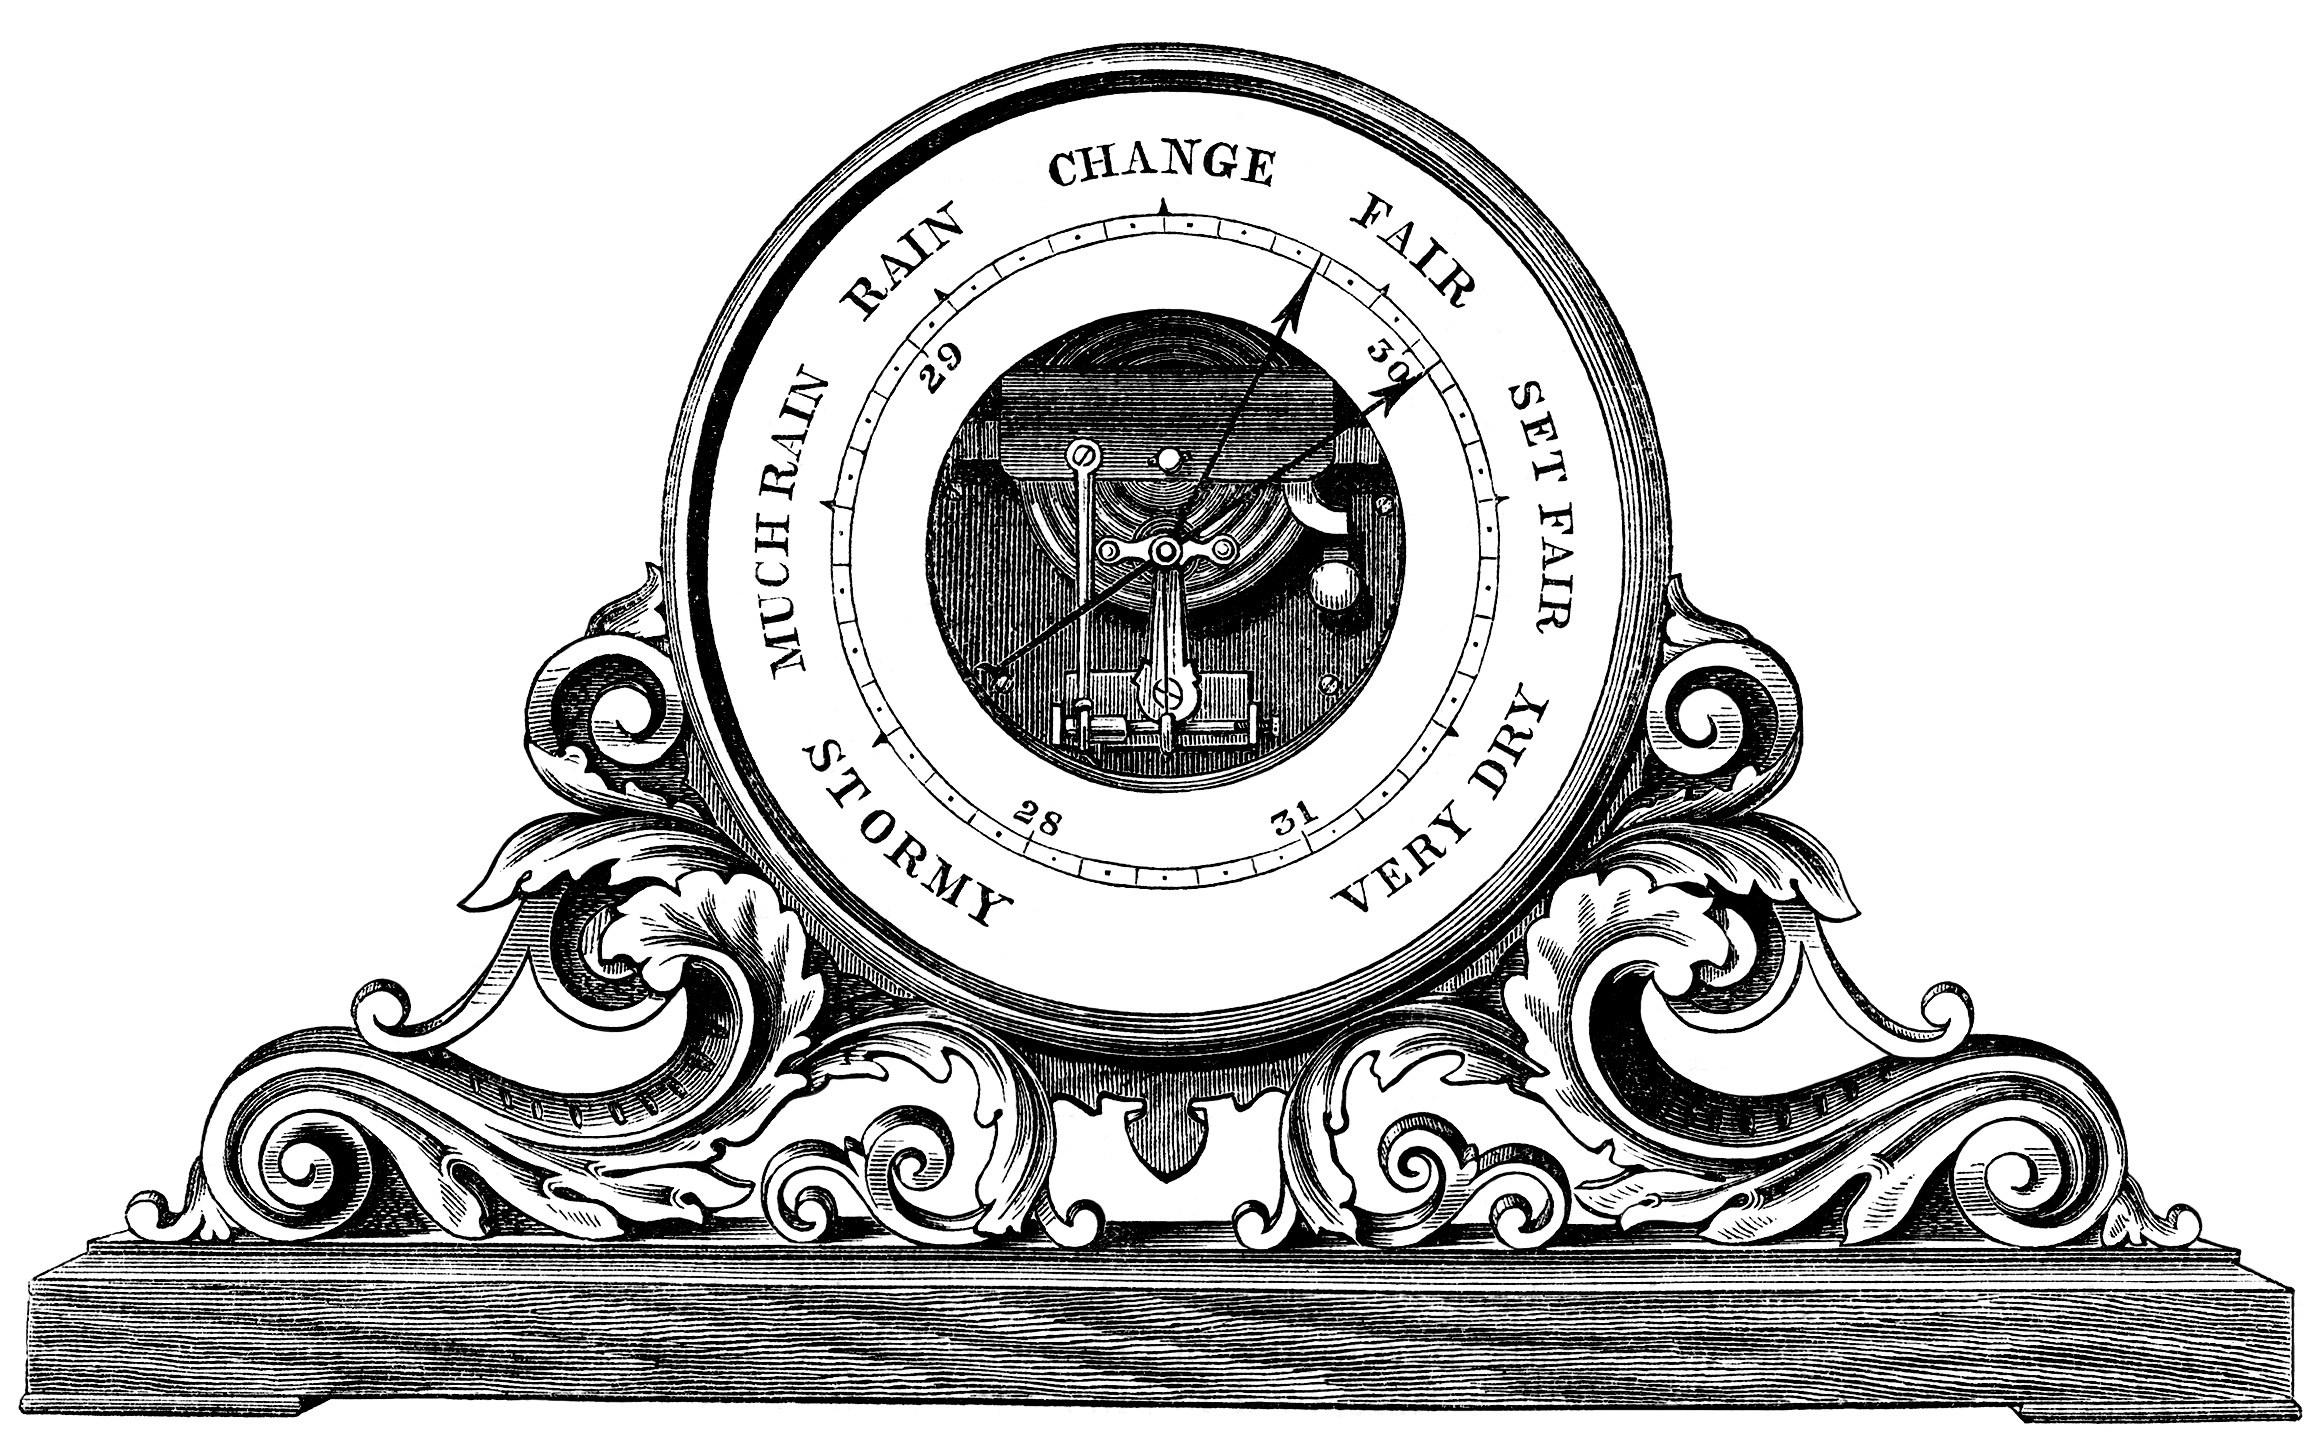 barometer clip art, black and white graphics, vintage barometer.